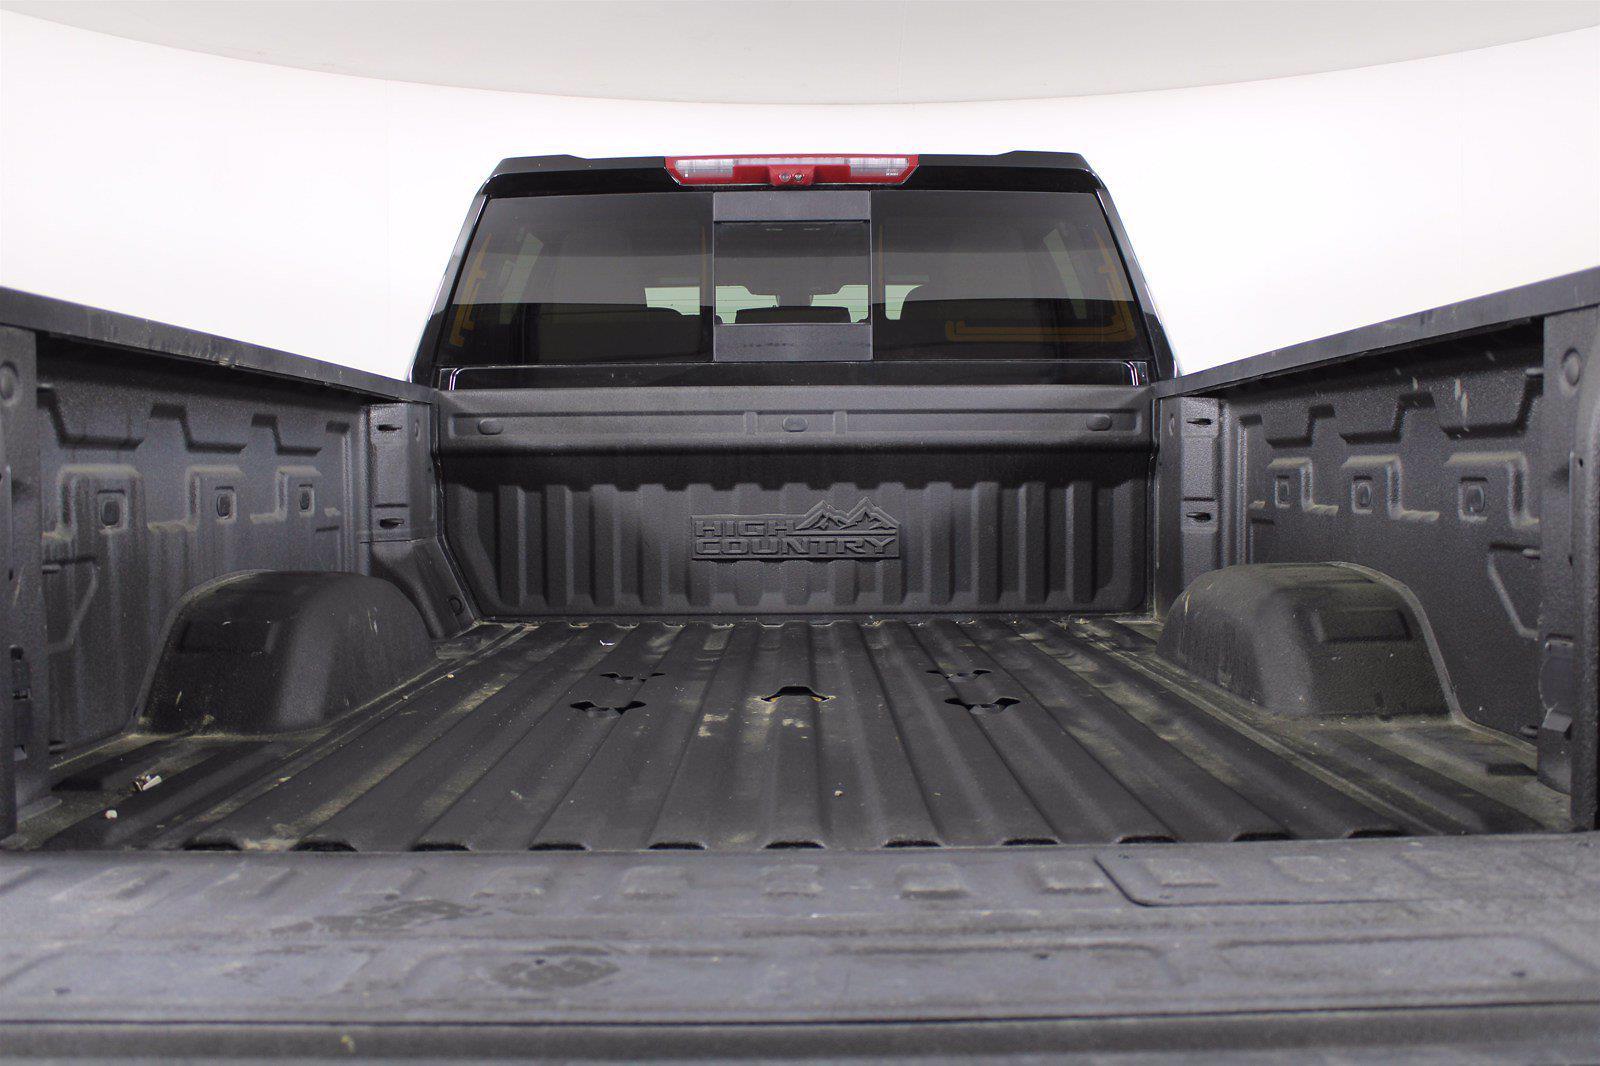 2020 Chevrolet Silverado 3500 Crew Cab 4x4, Pickup #DAZ0421 - photo 2